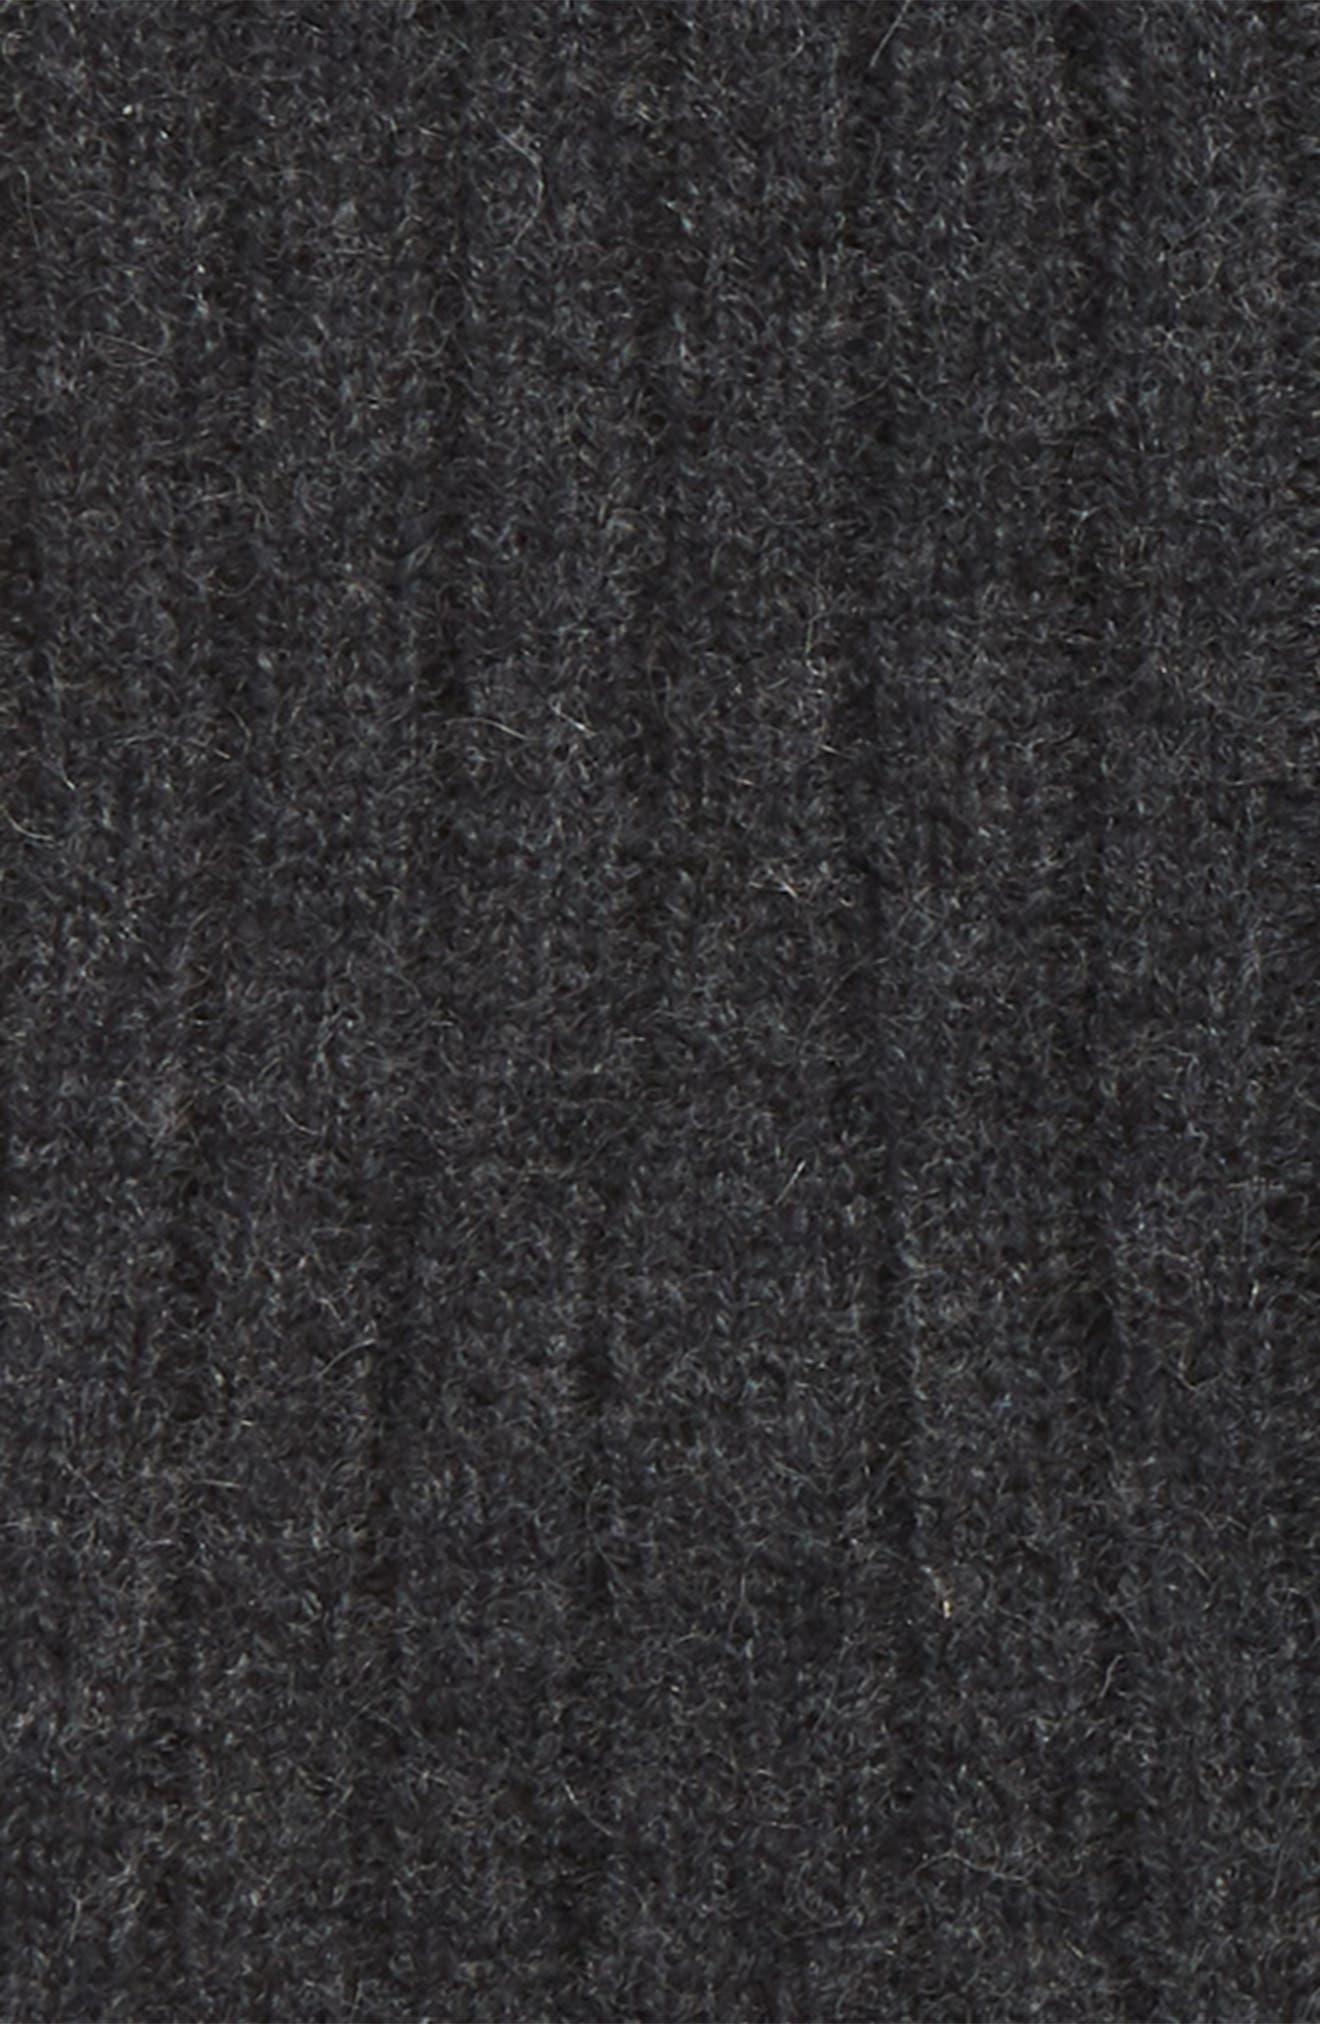 Cashmere Arm Warmer,                             Alternate thumbnail 2, color,                             BLACK ROCK HEATHER